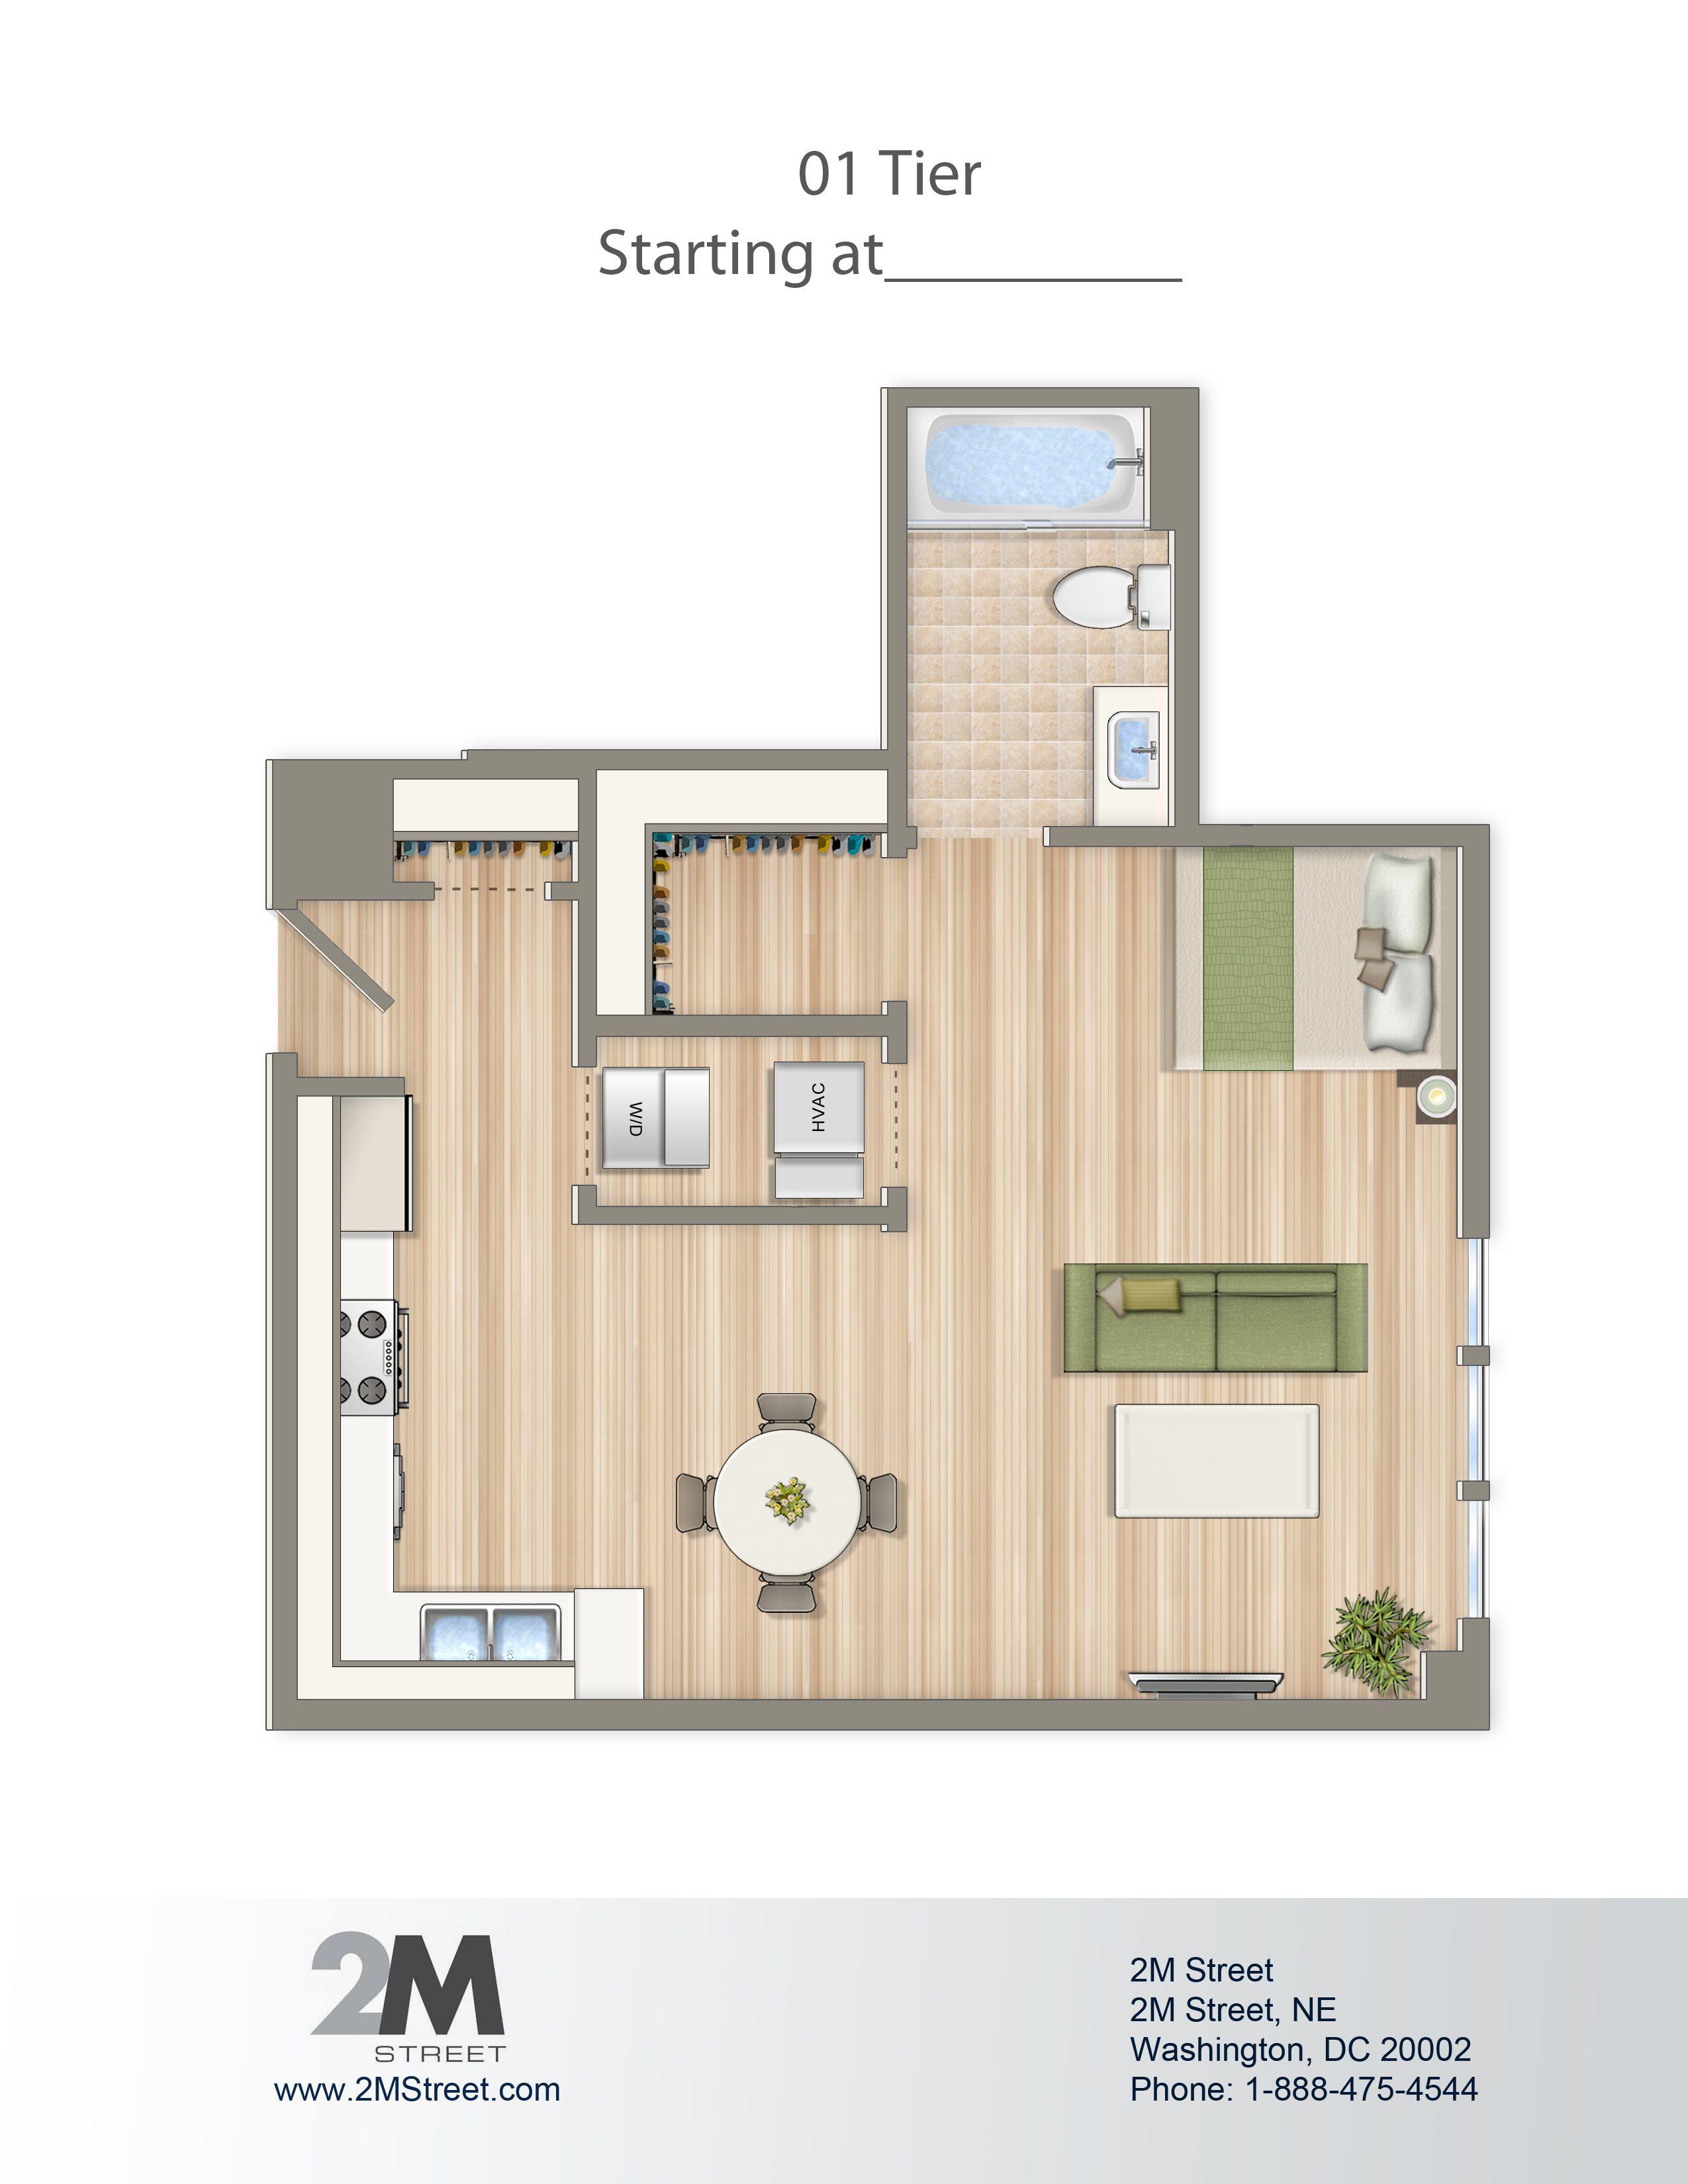 Efficiencystudio Floor Plan - 2M Street In Northeast Washington Dc